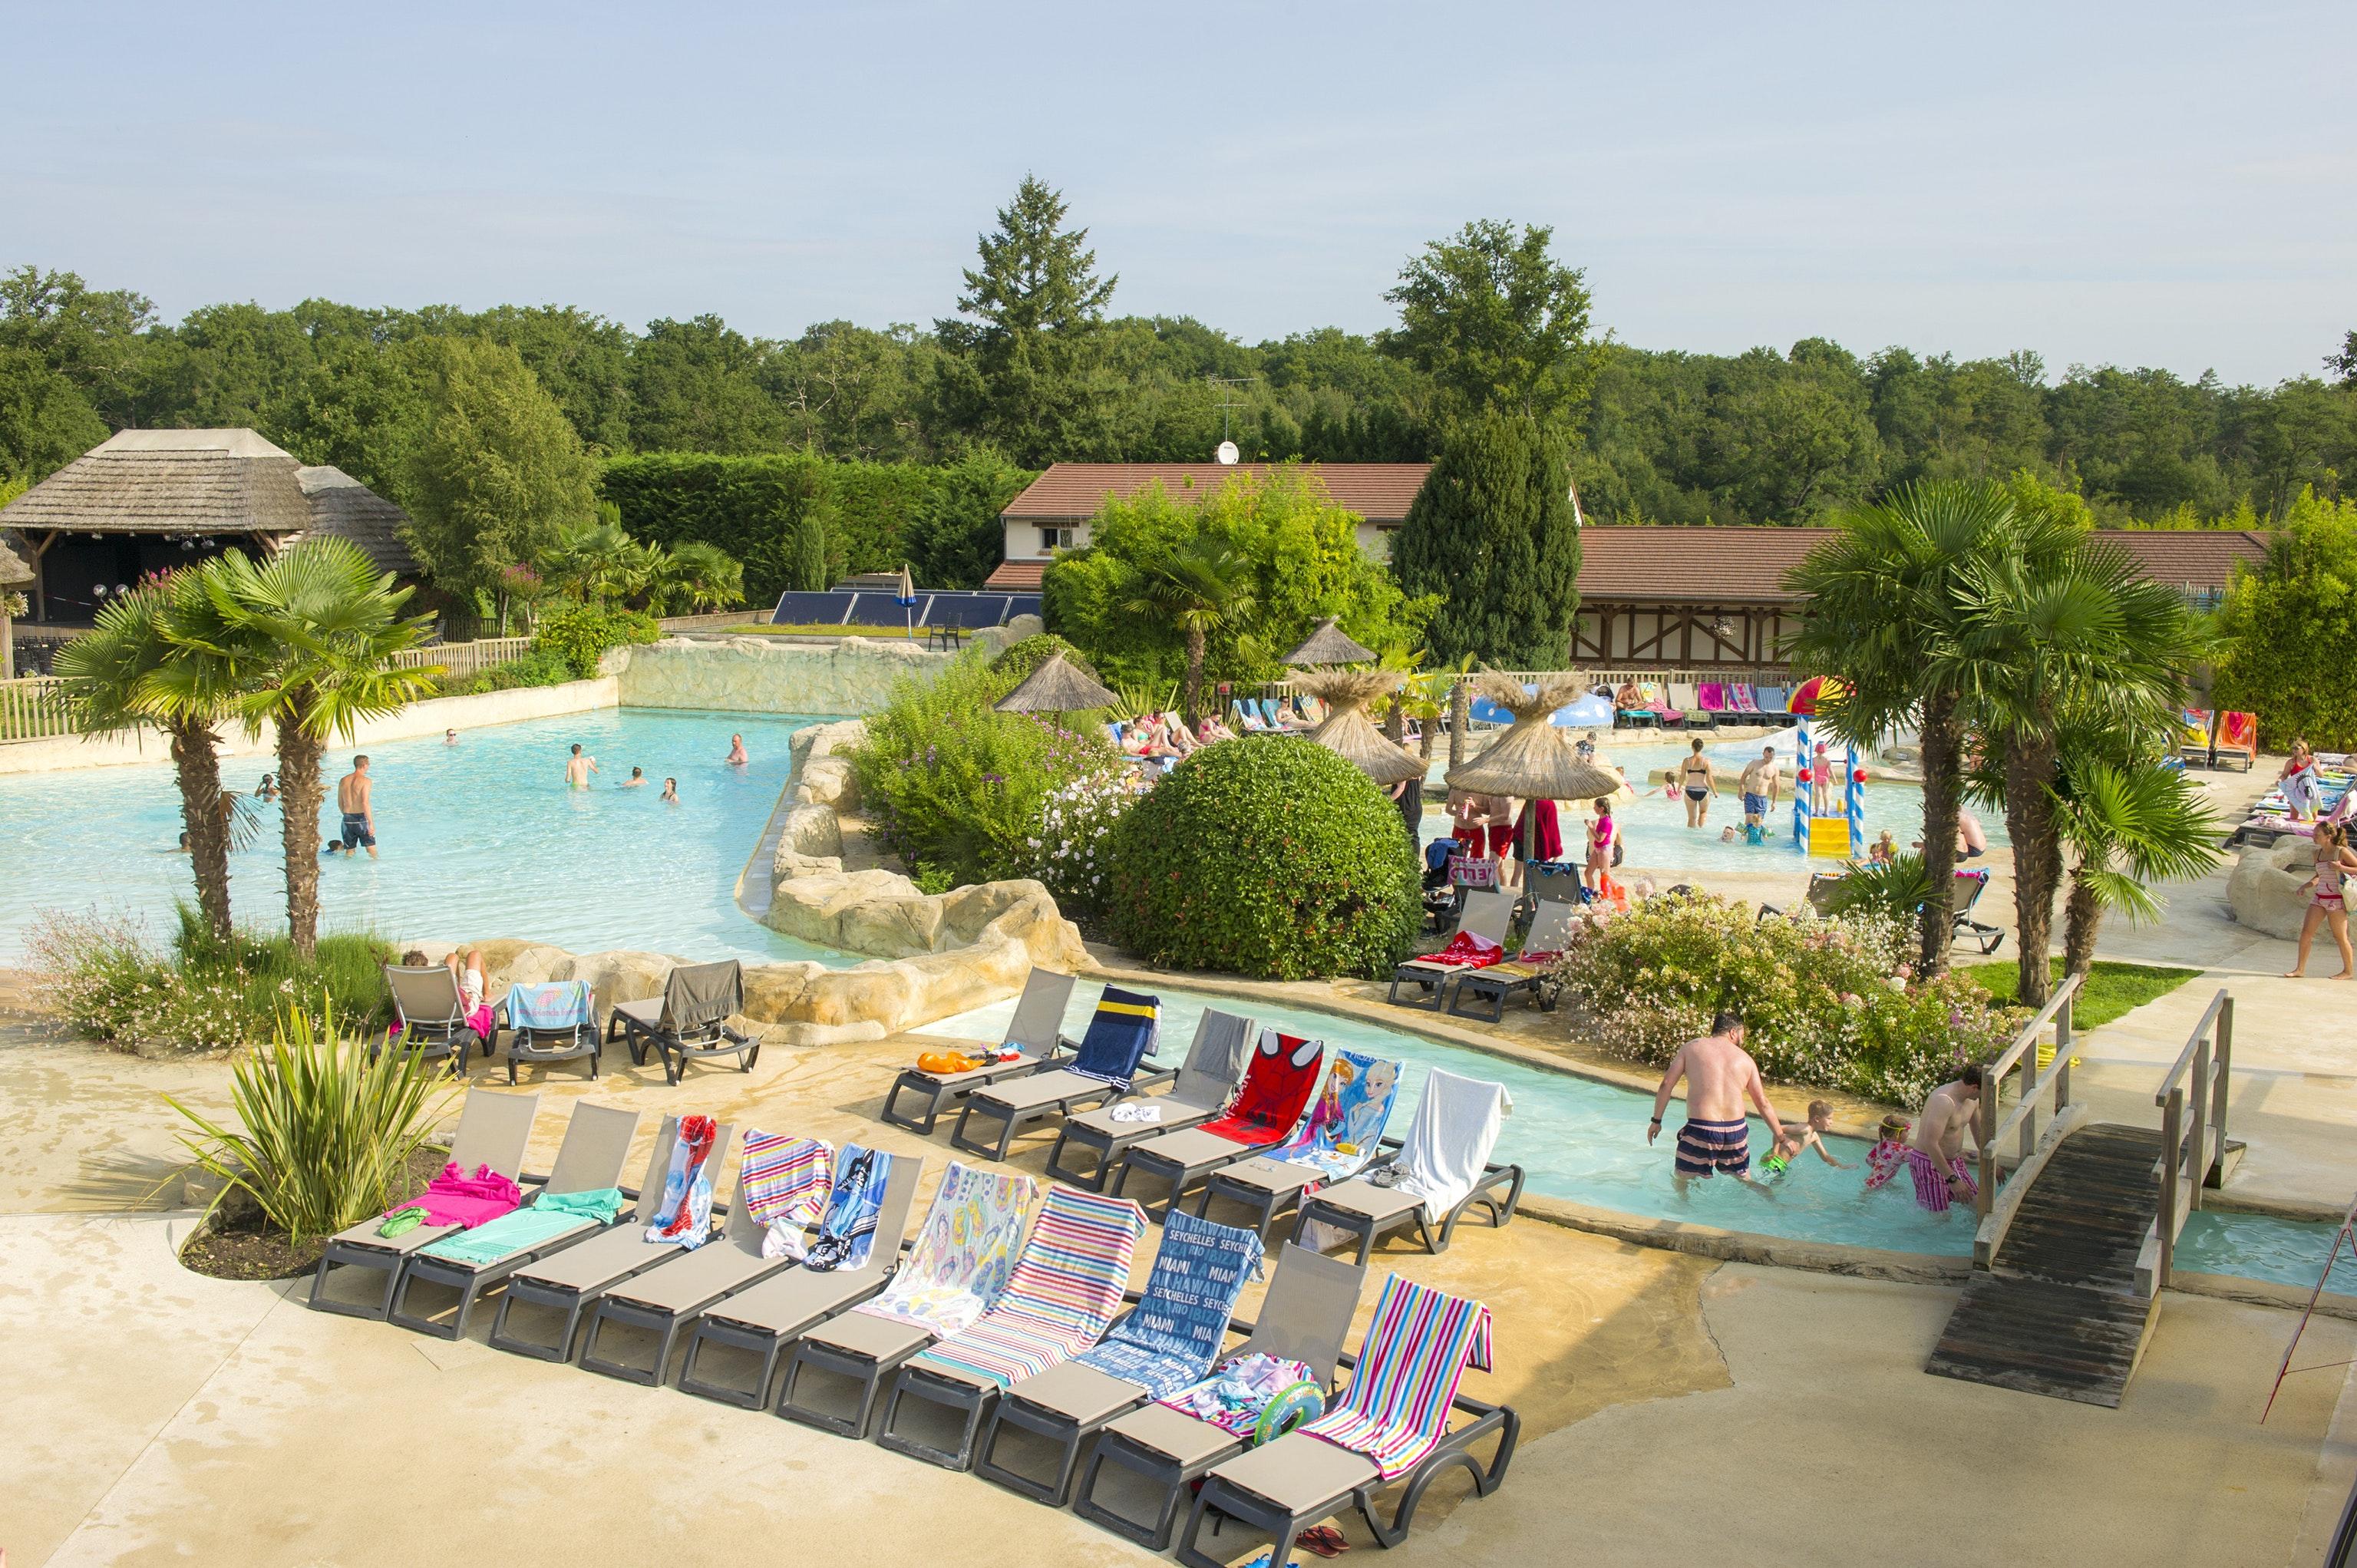 zwembad 3 alicourts